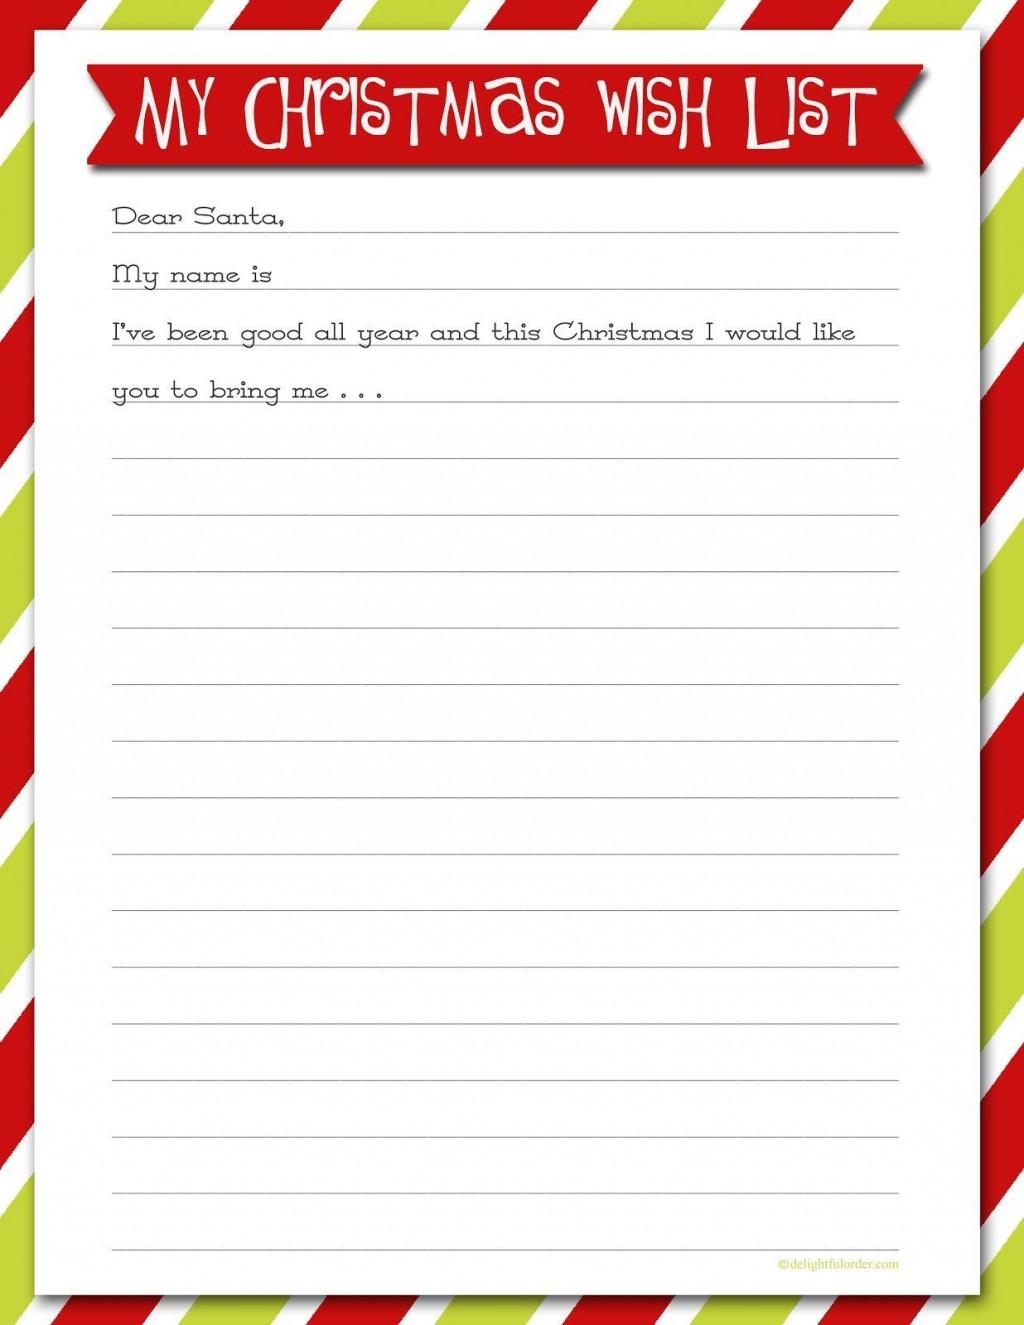 007 Rare Printable Wish List Template High Resolution  Cute Christma Free HolidayLarge